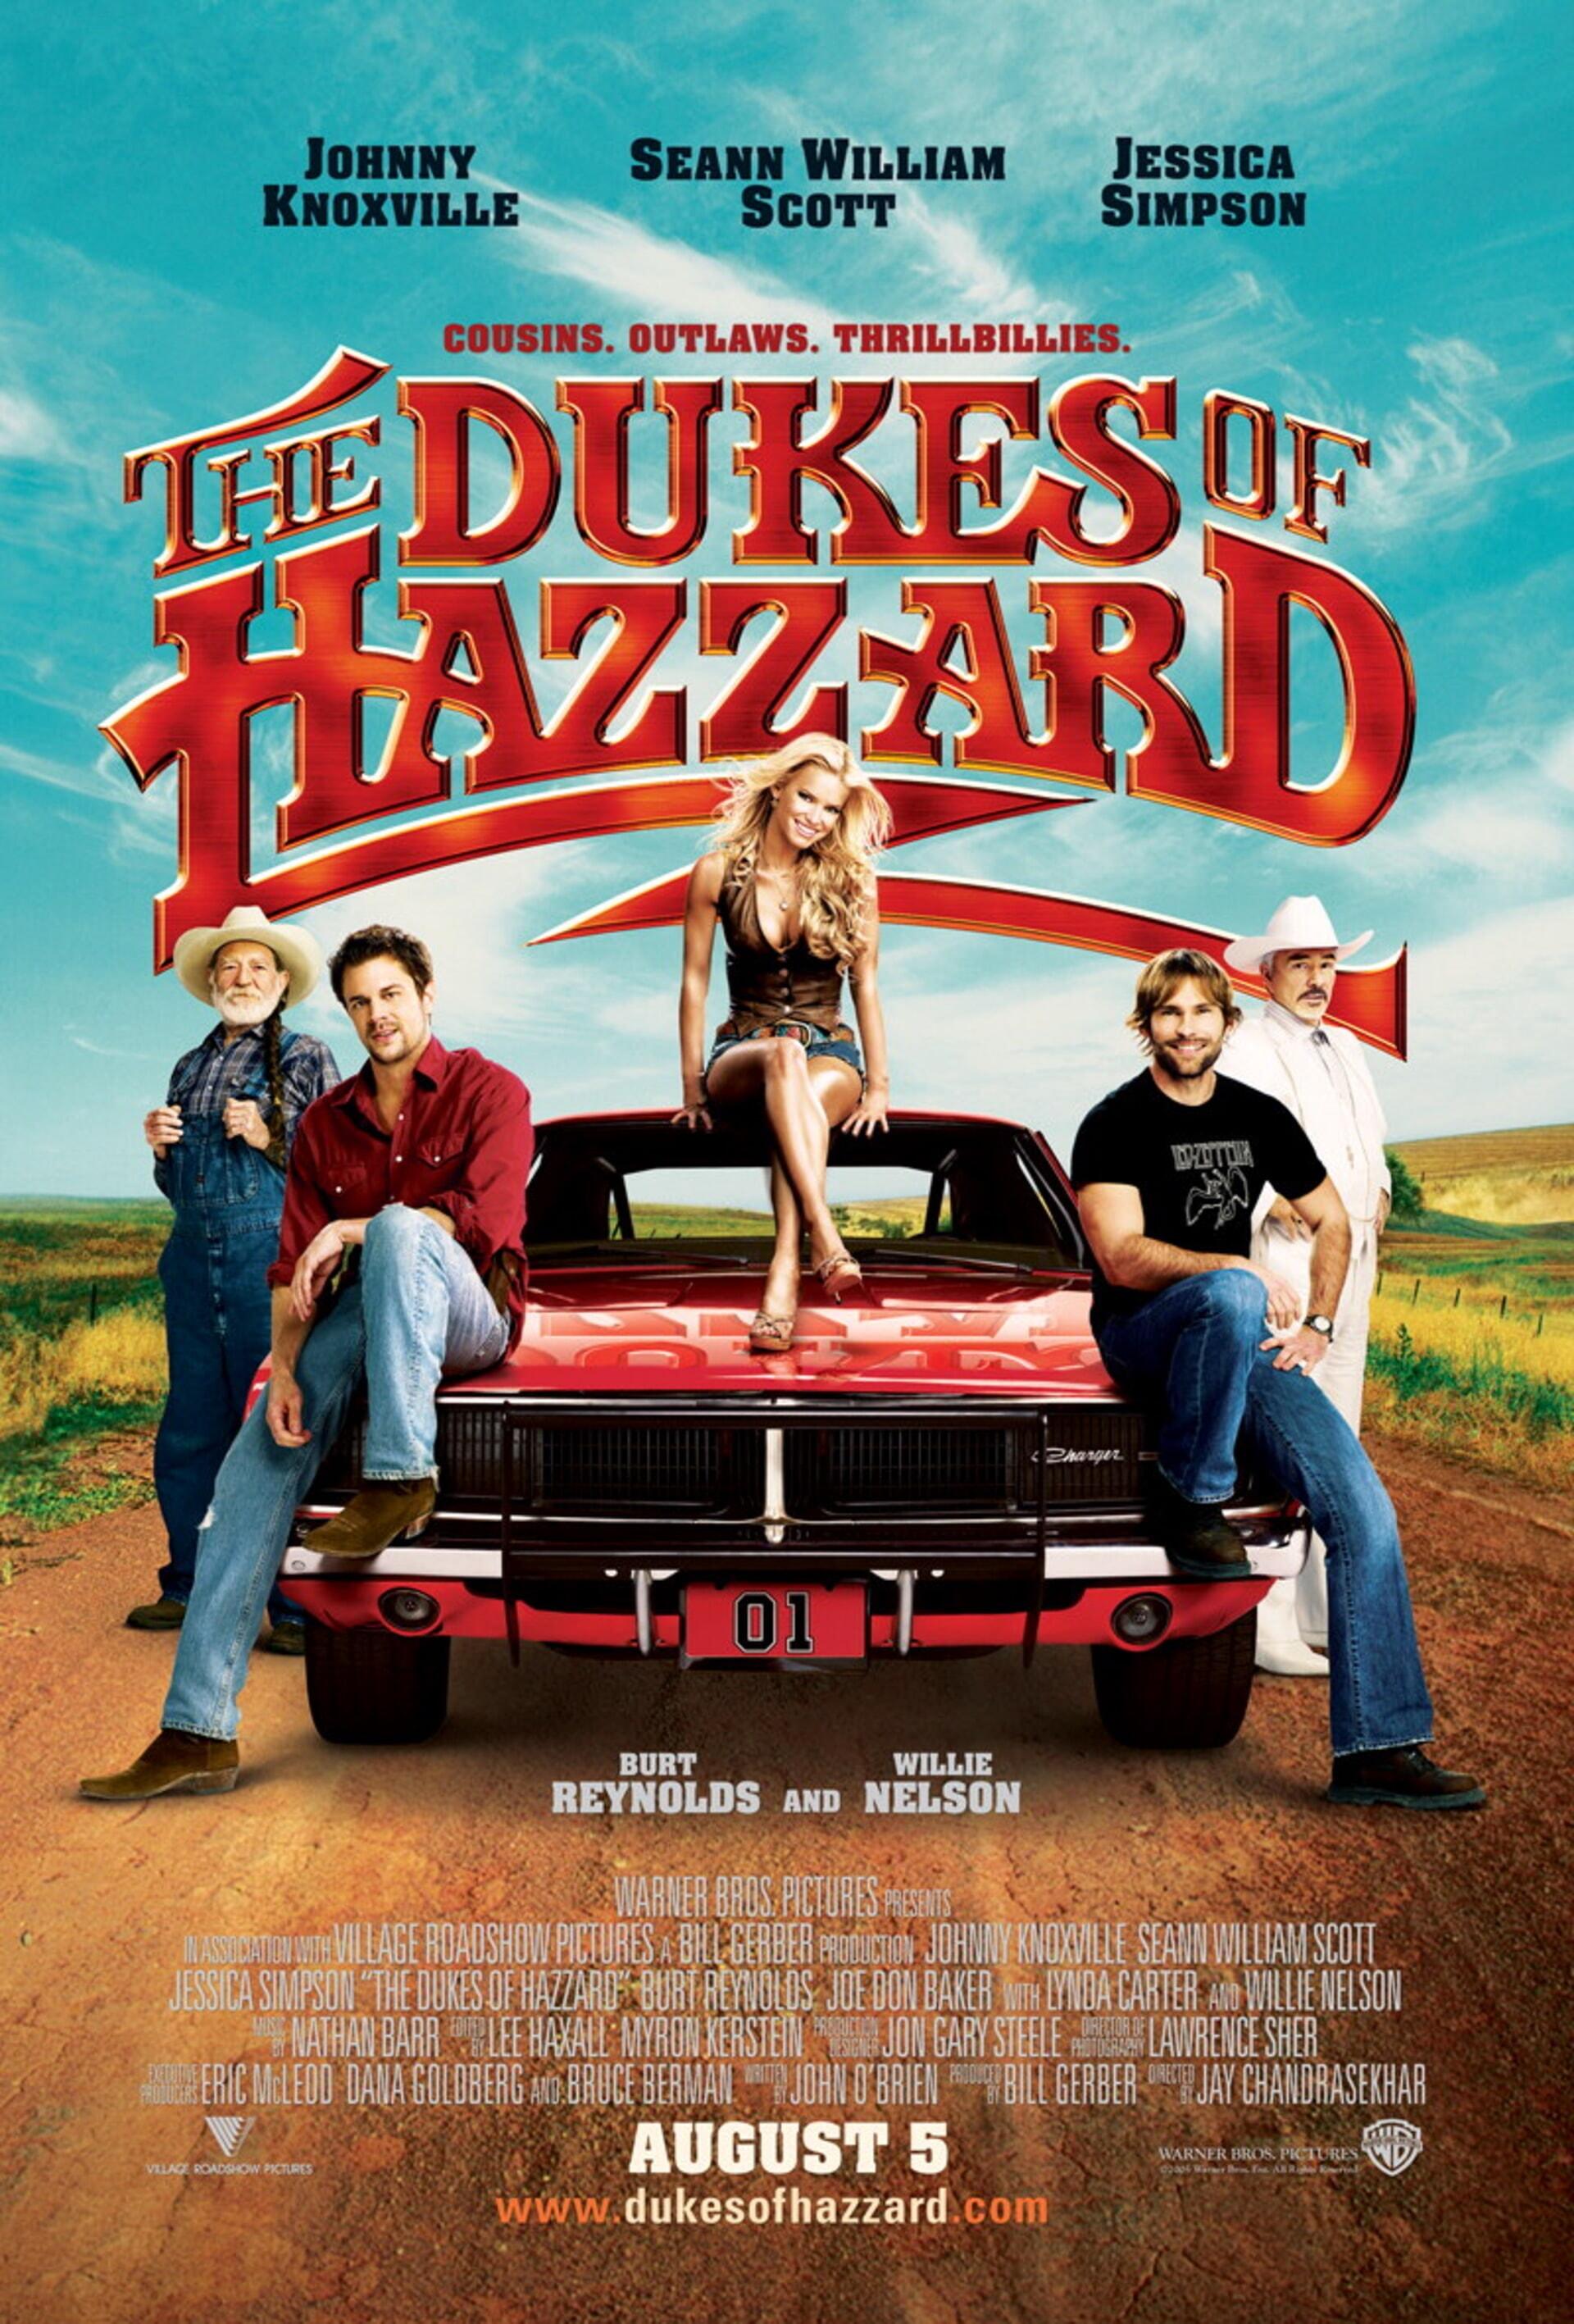 The Dukes of Hazzard - Poster 1